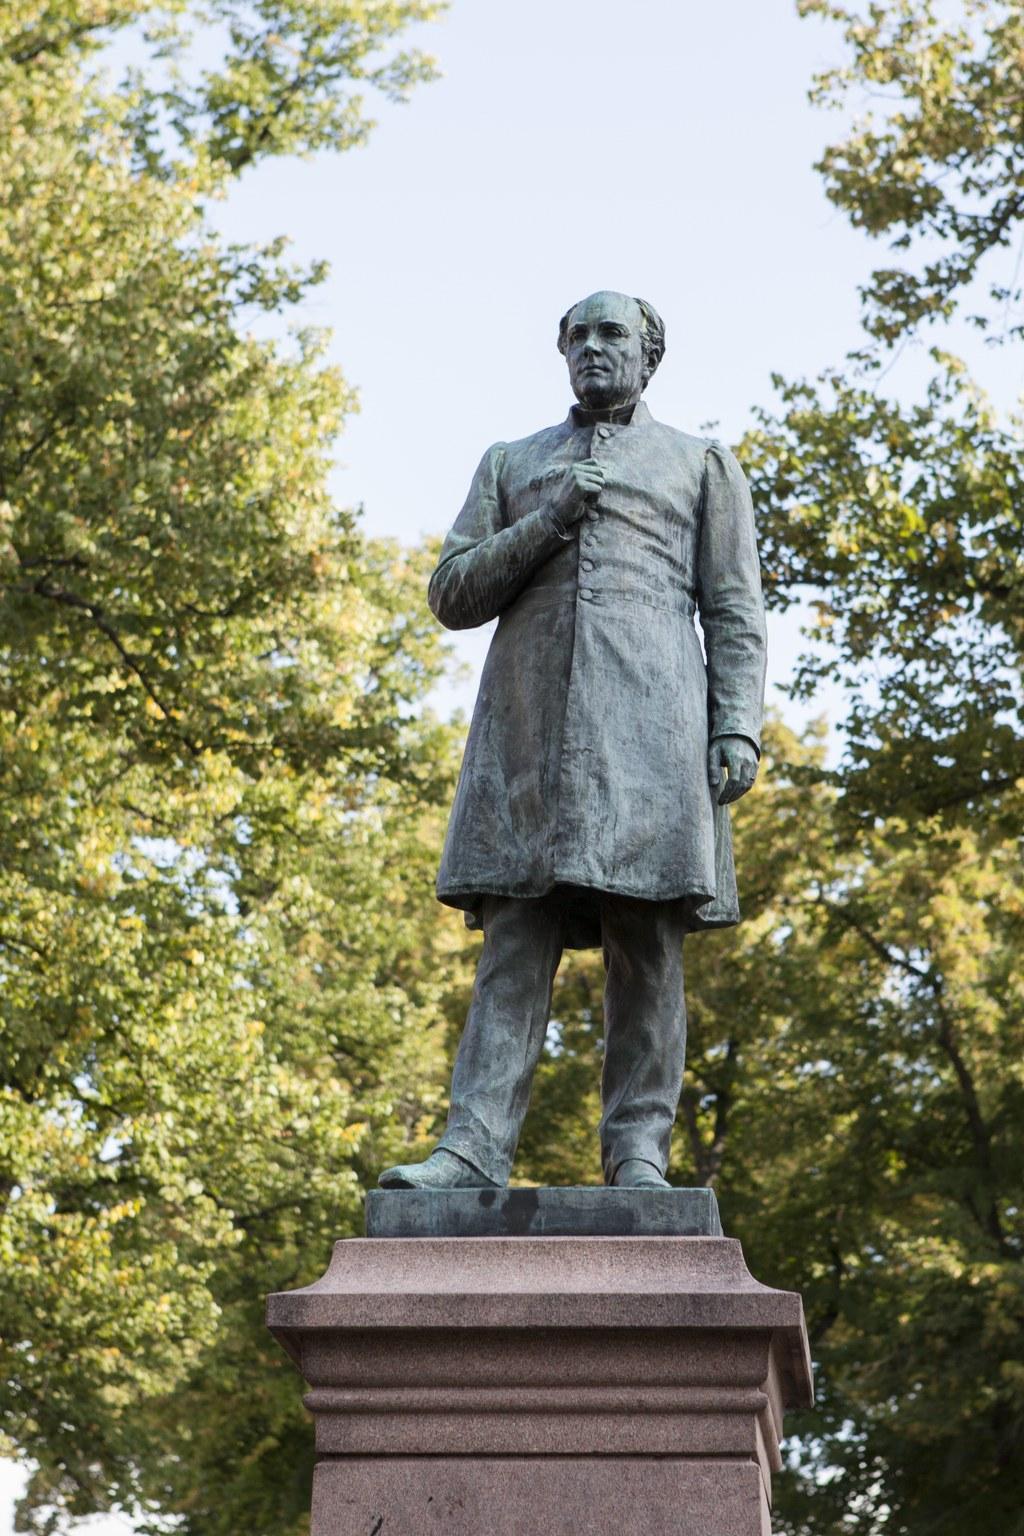 J. L. Runebergin patsas Porvoossa